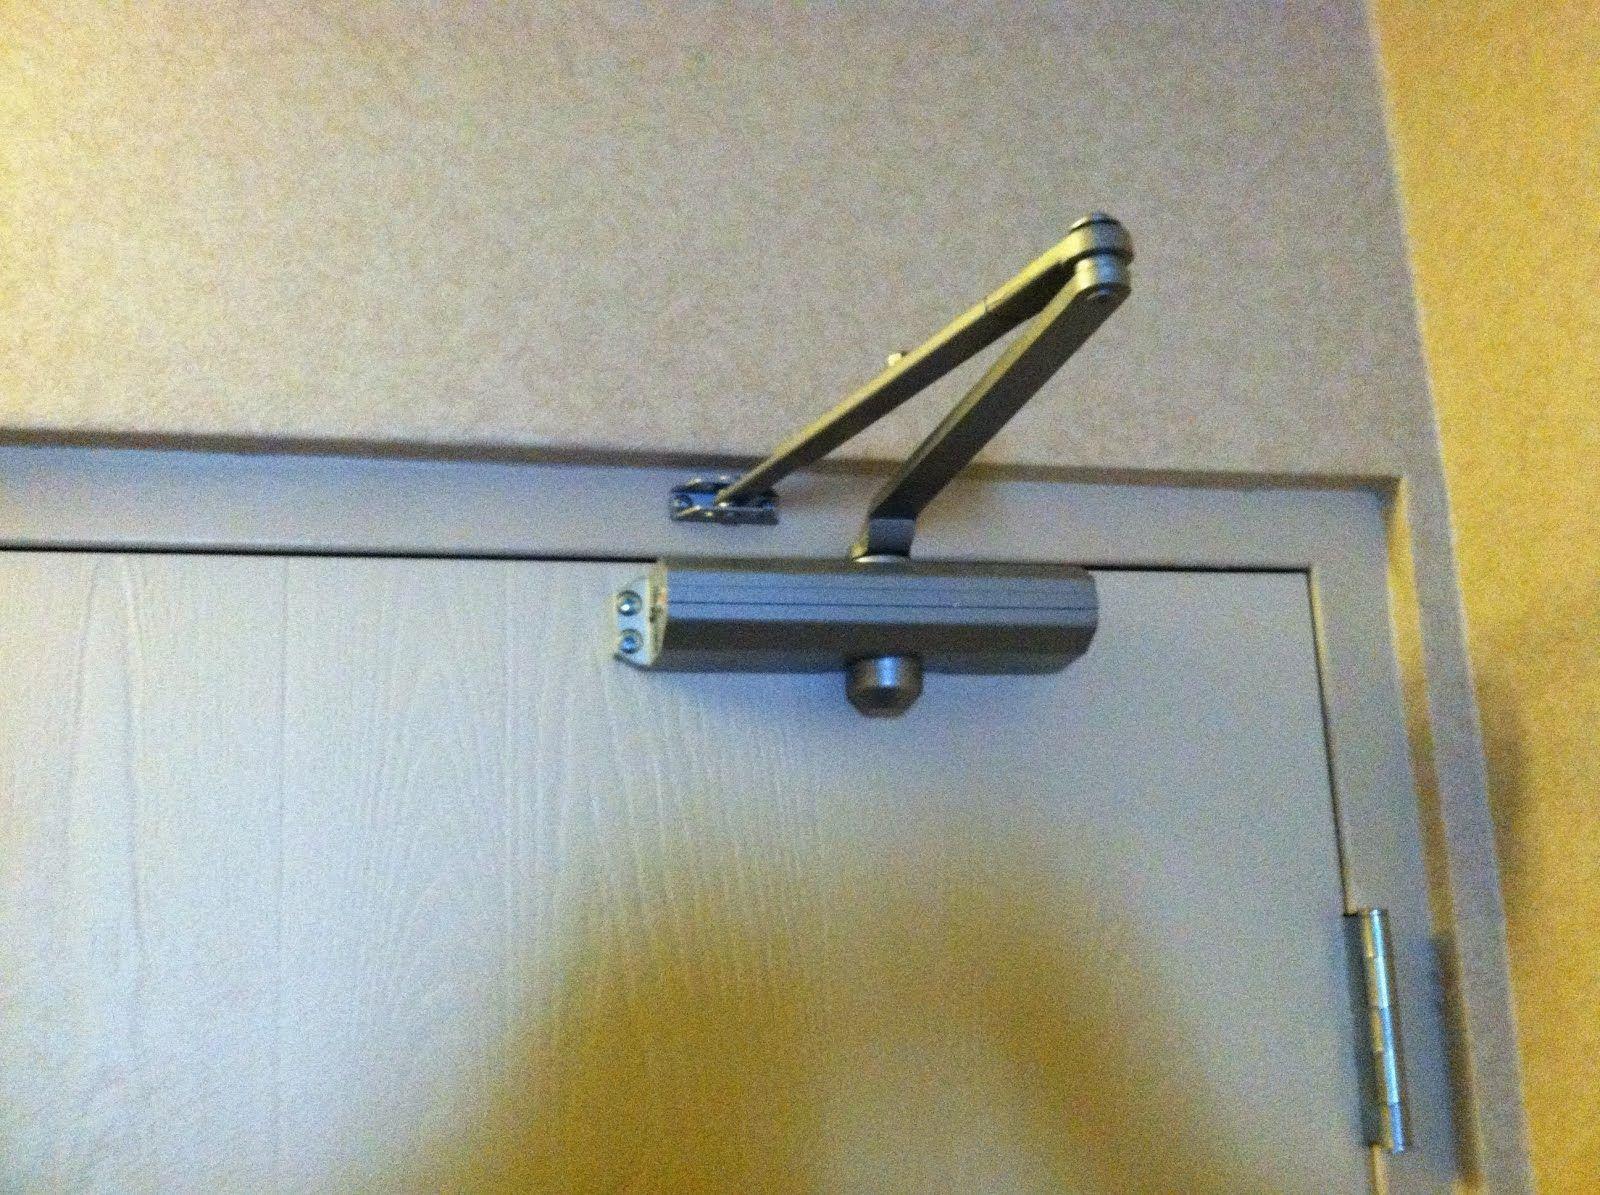 Choosing door closer and curtain brackets from interior